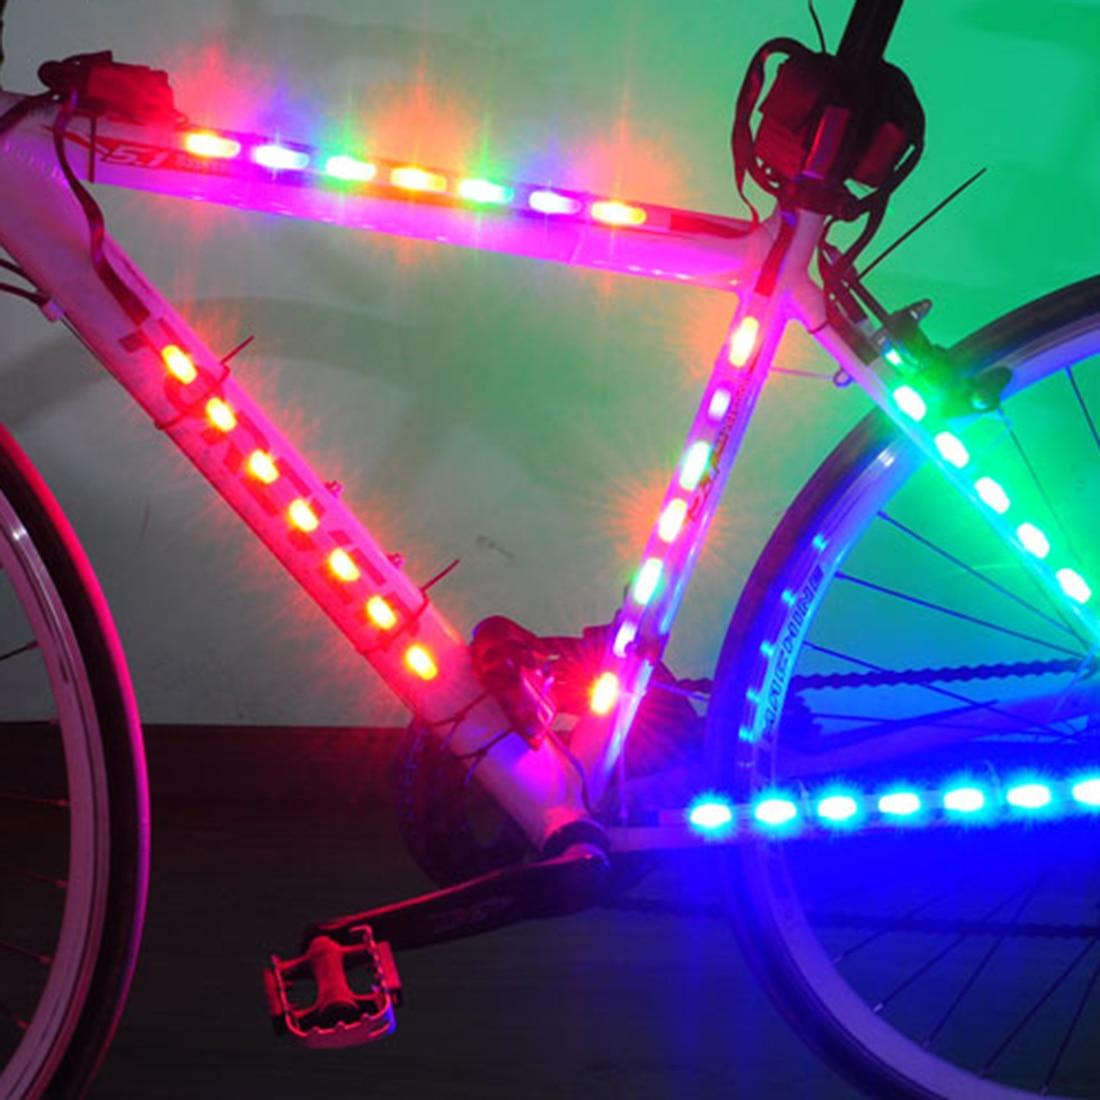 Battery Bicycle Light LED Bike Lamp Safety Spoke Light Strip Tape Light Bike Frame Decorative Lantern Bike Accessories Cycling yy 601a 7led cycling bicycle hot wheels spoke decorative lamp 9 change pattern